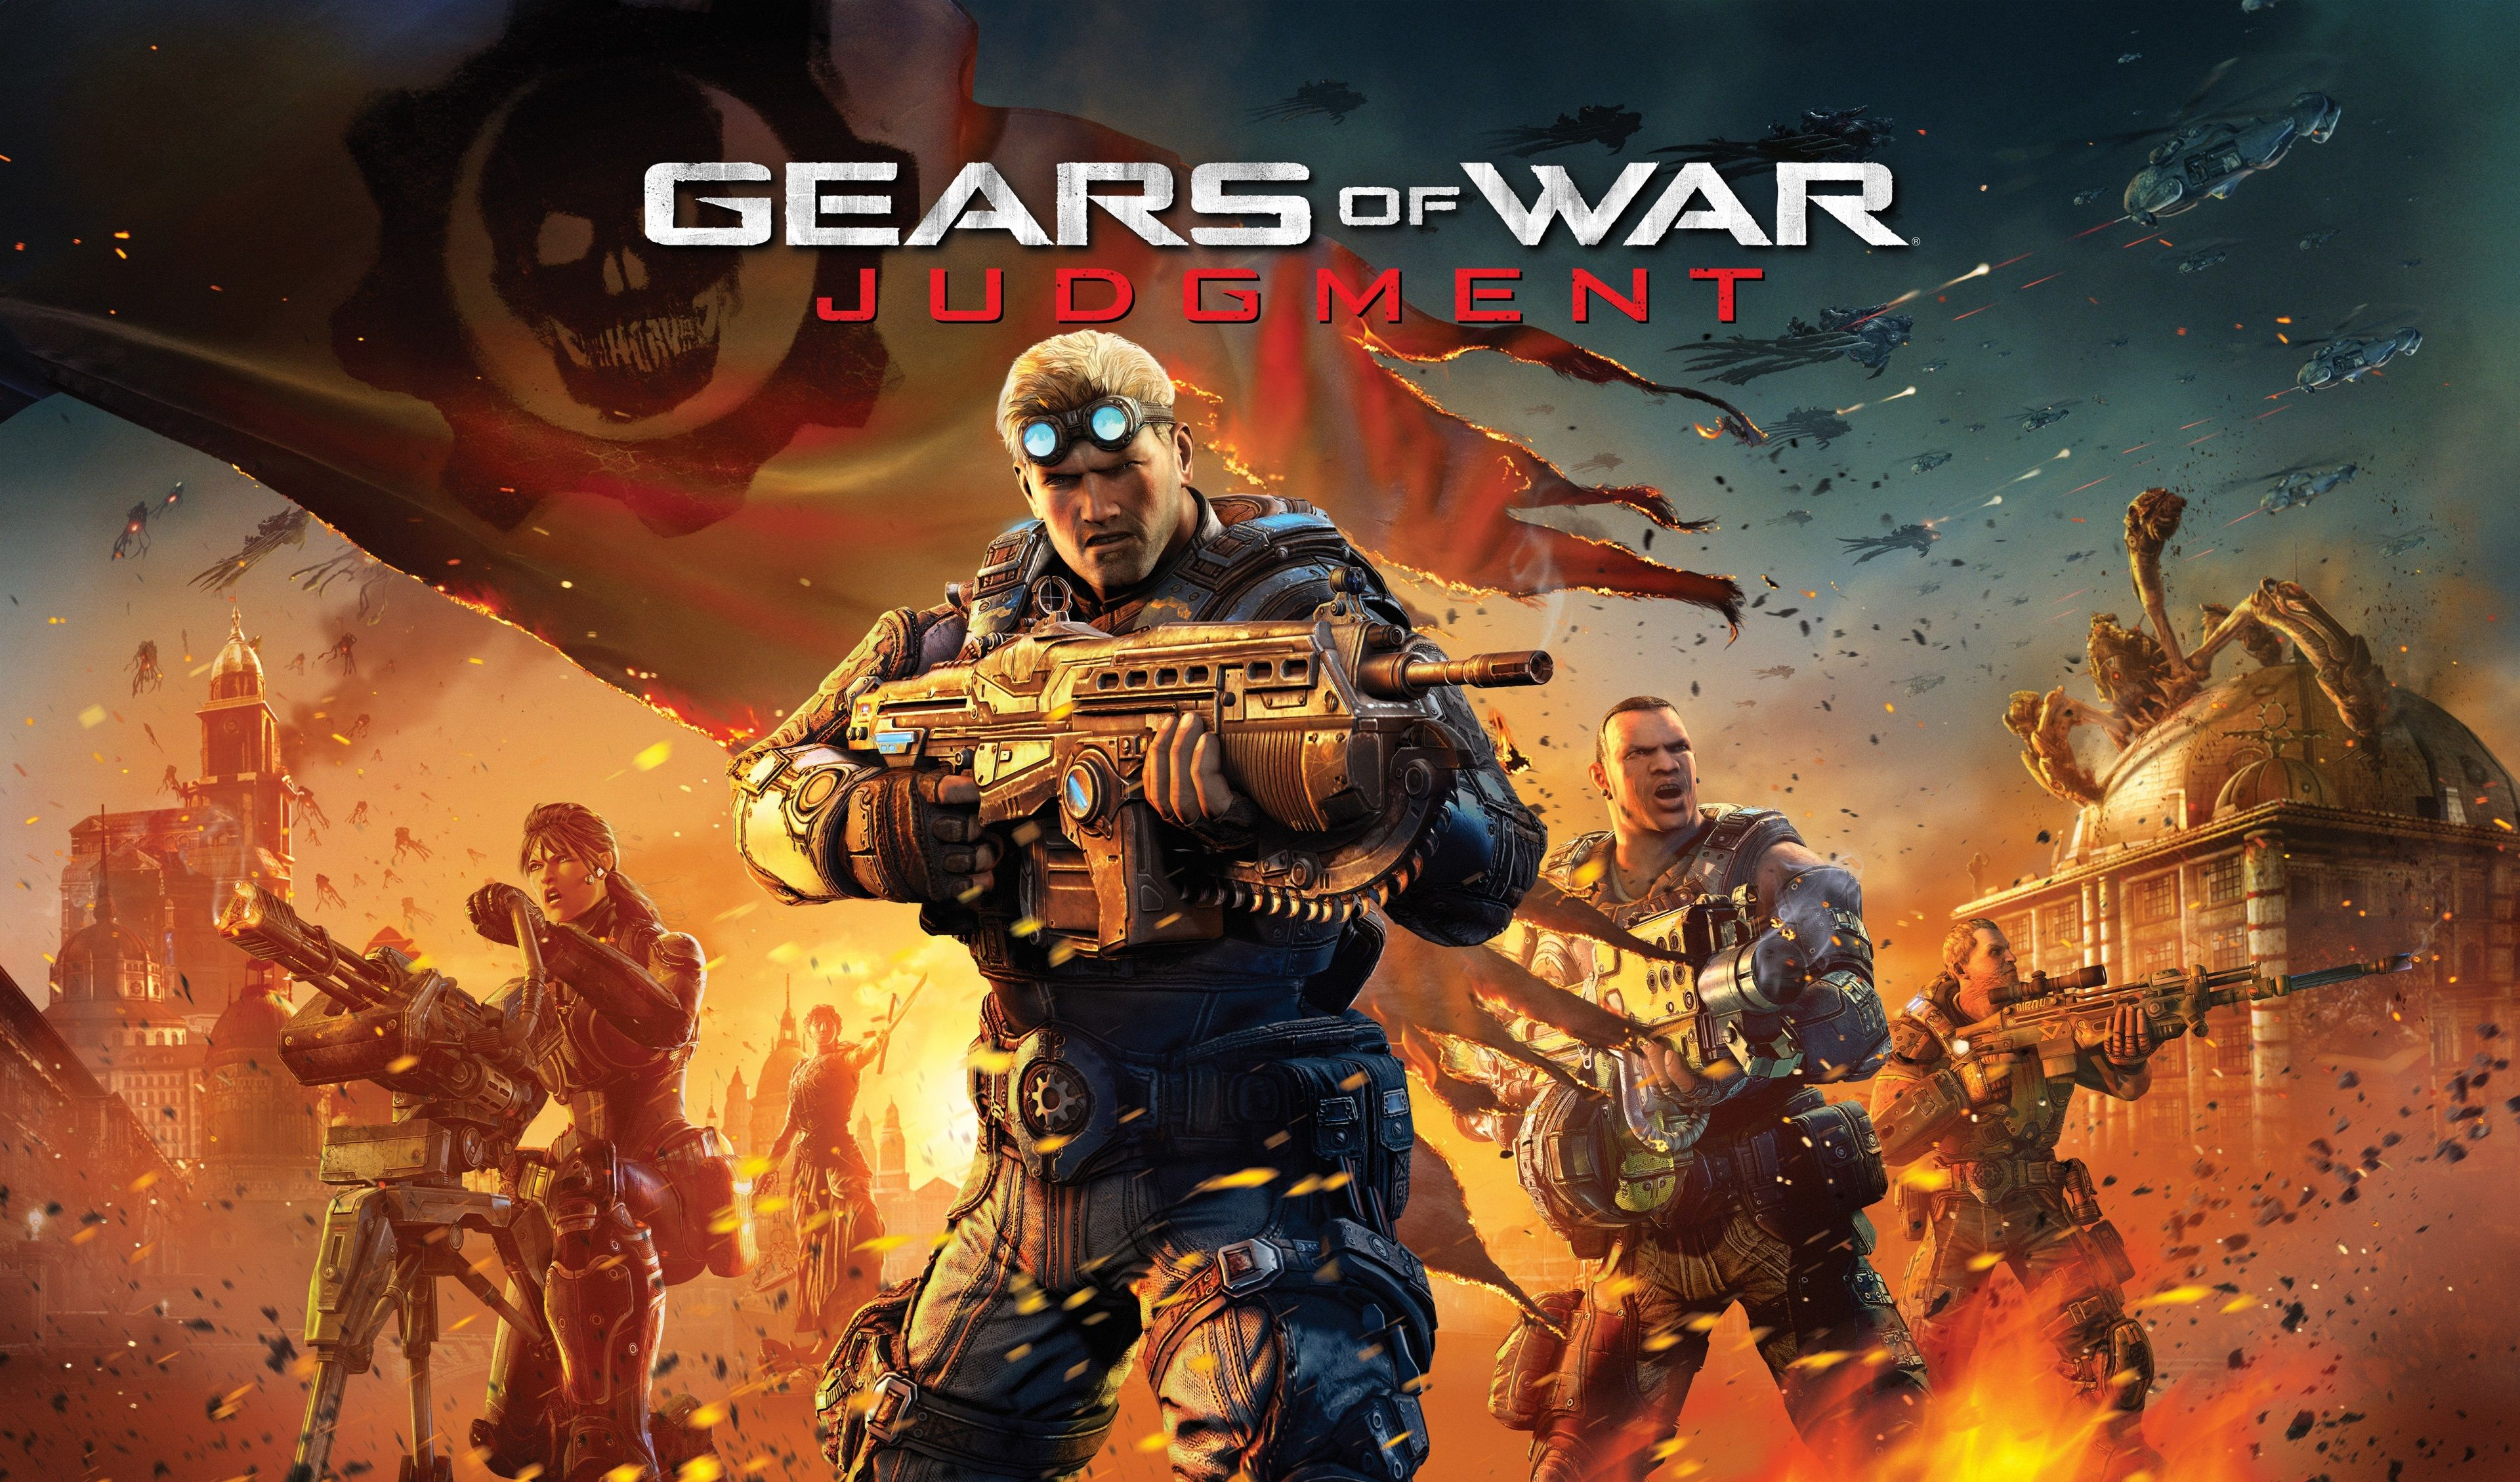 3840x2259 Gears Of War 4k Computer Wallpaper Desktop Background Gears Of War Gears Of War Judgment Xbox 360 Games